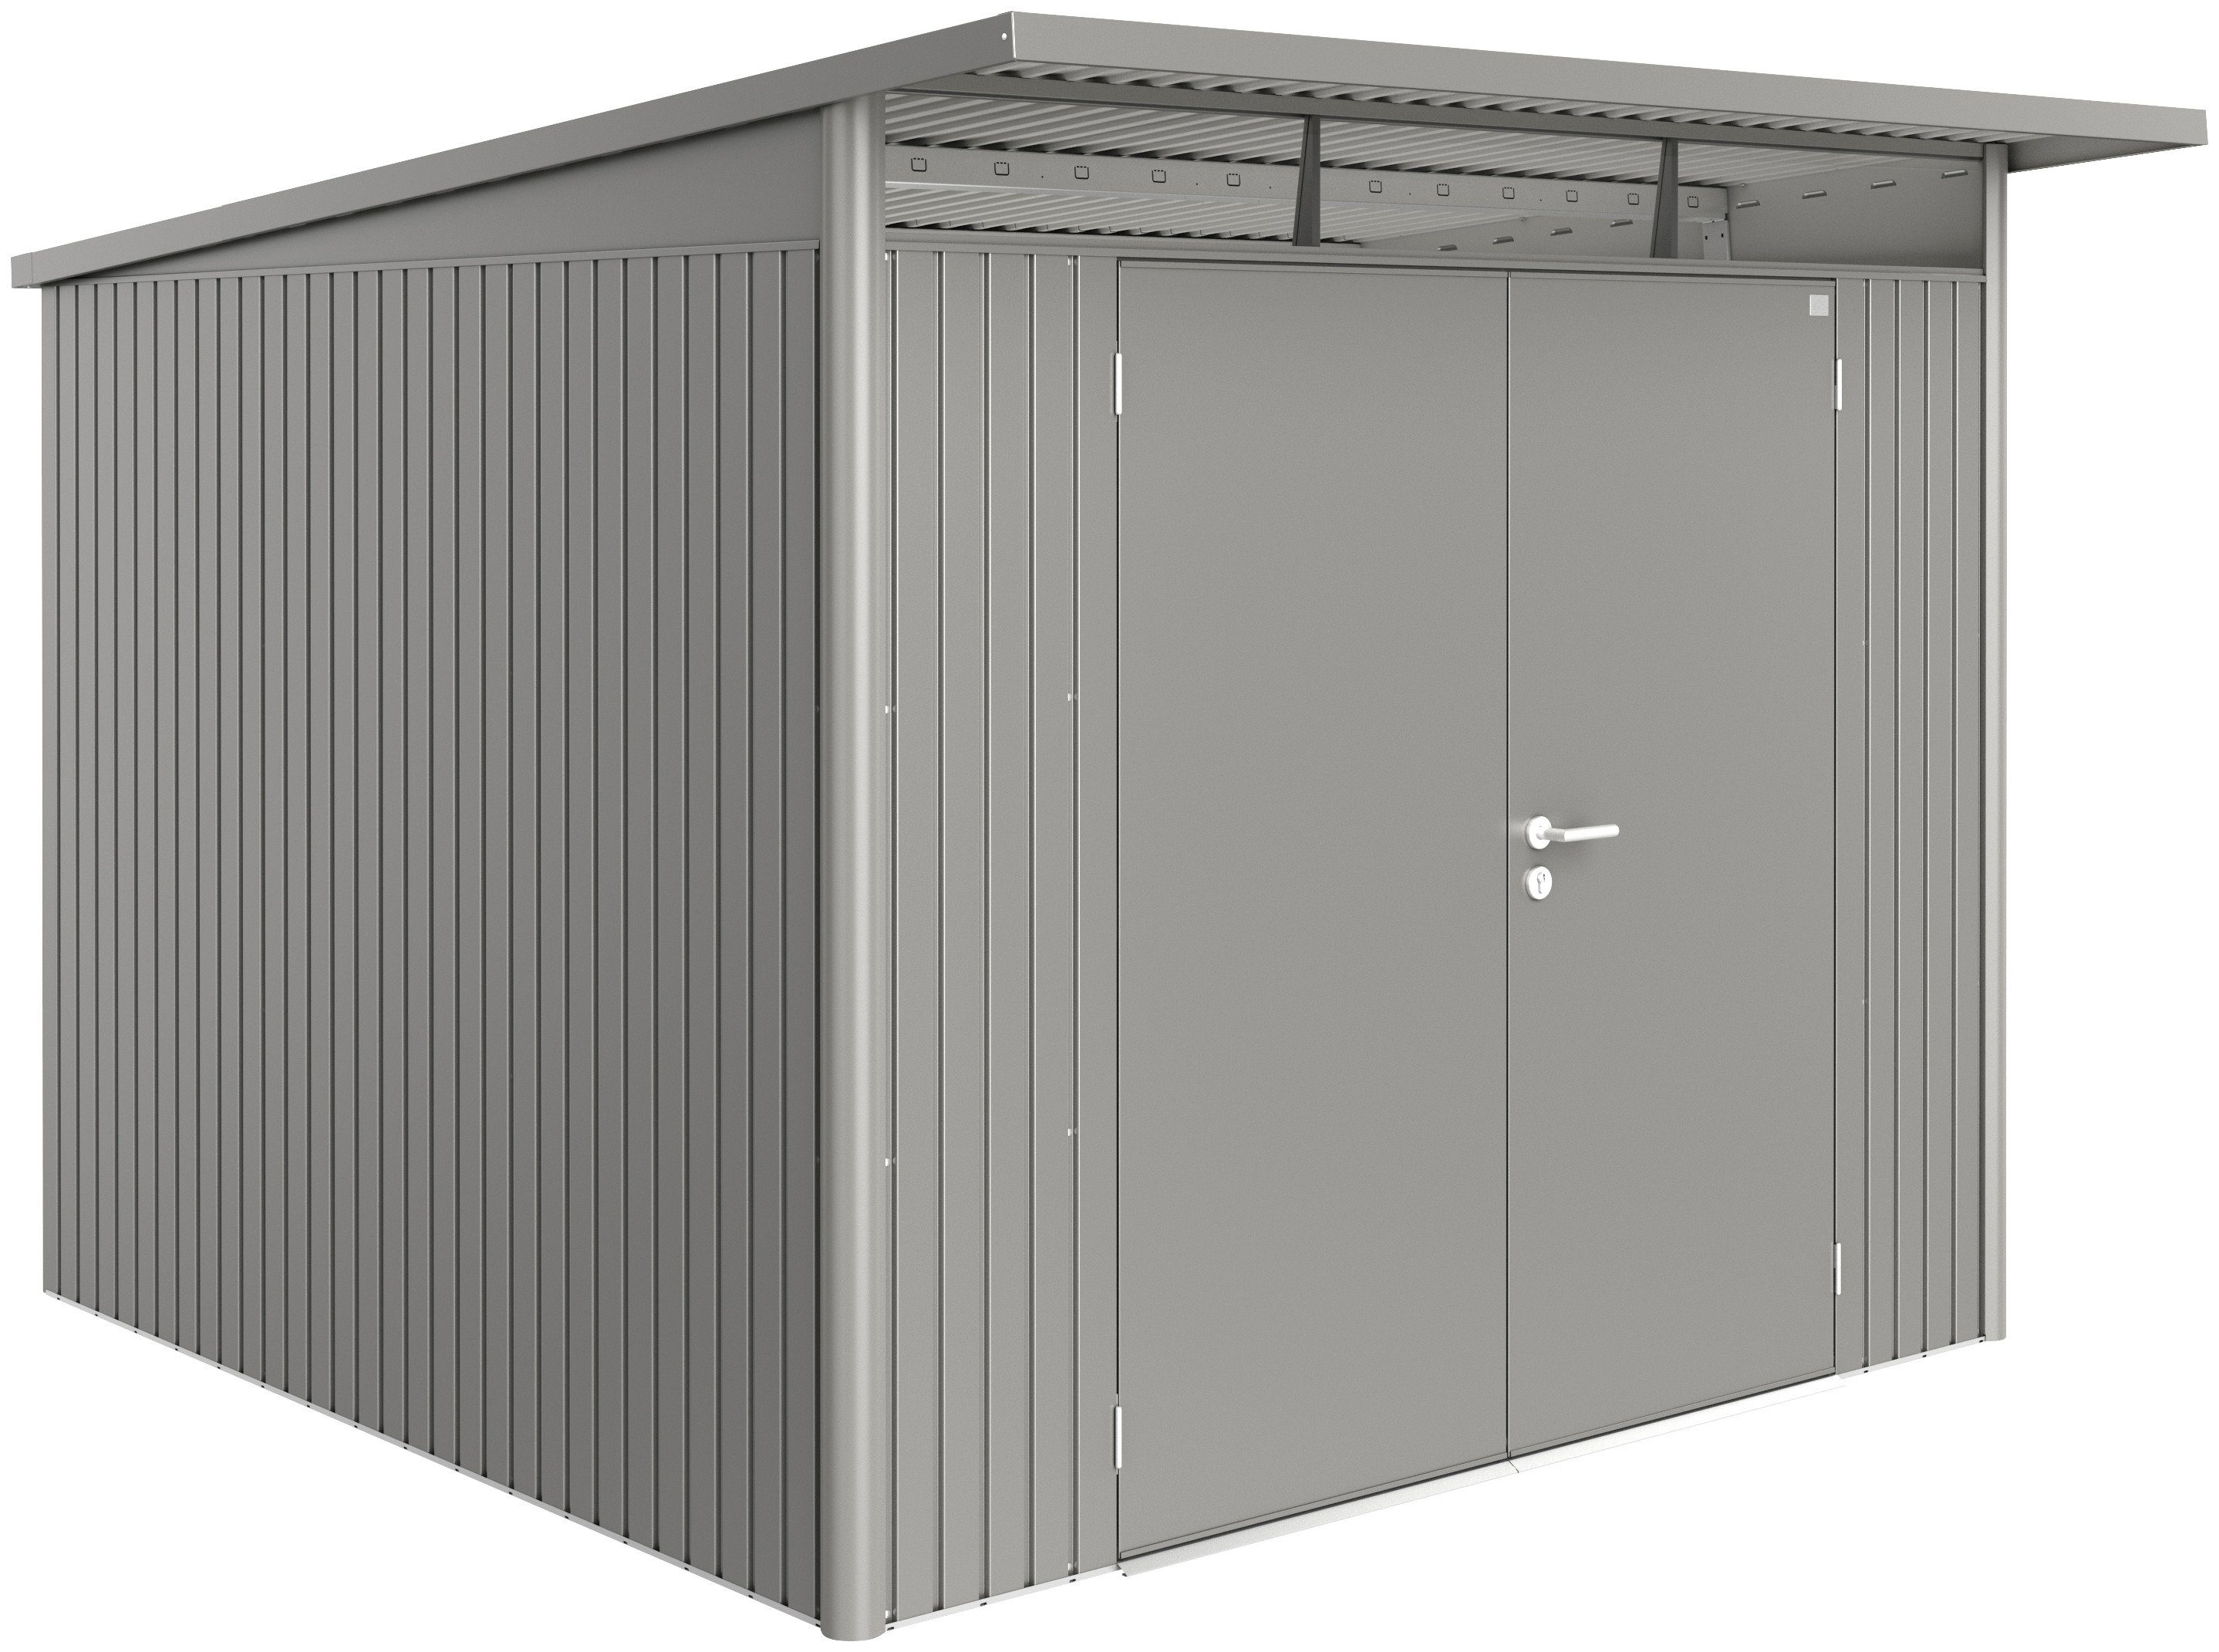 BIOHORT Stahlgerätehaus »AvantGarde XL«, BxT: 252 x 252 cm, quarzgrau-metallic